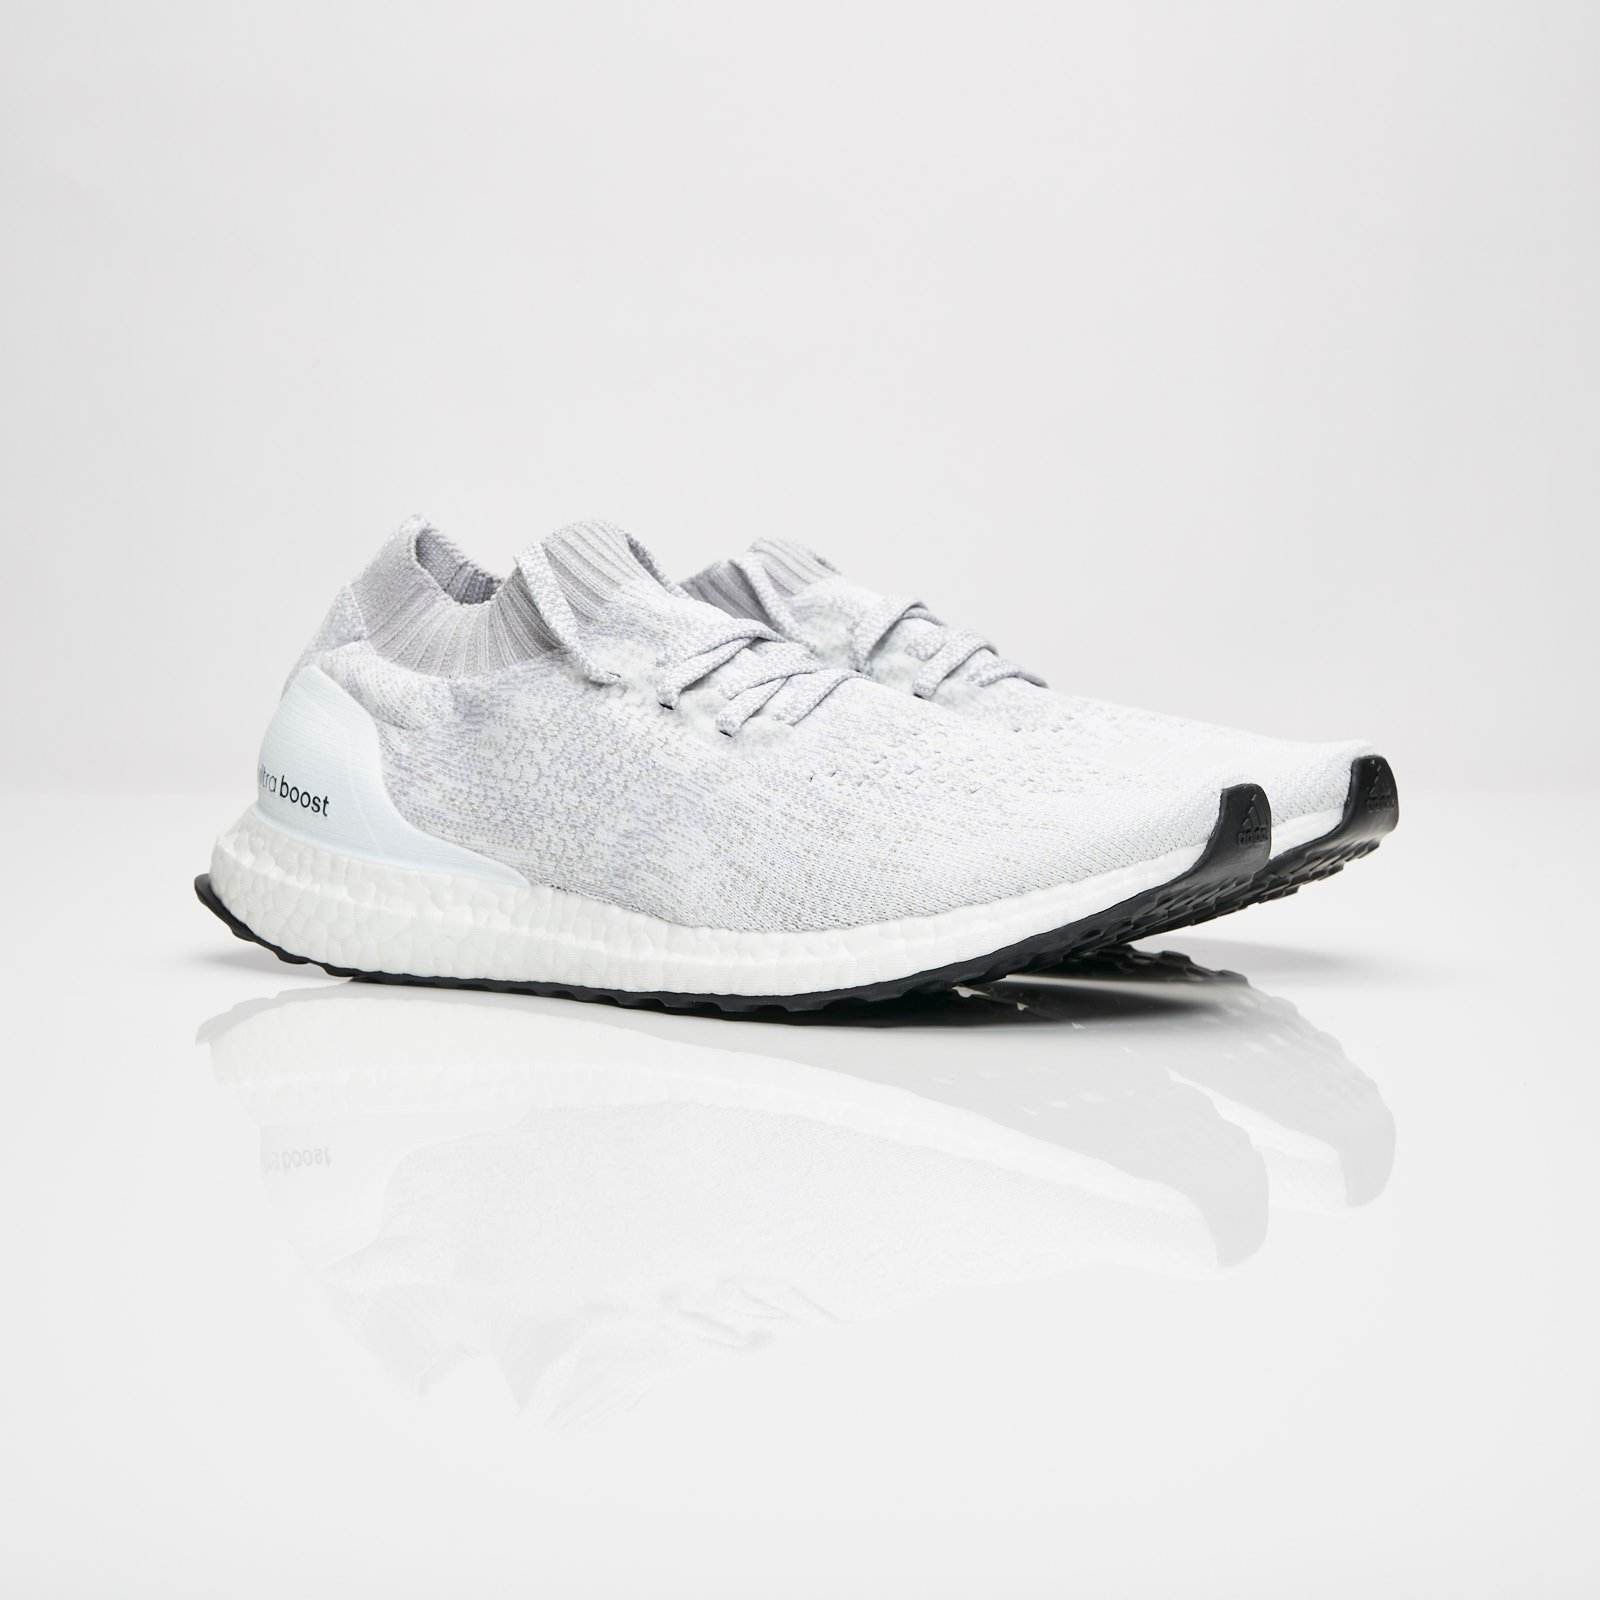 f69b2496bfbe adidas UltraBOOST Uncaged - Da9157 - Sneakersnstuff